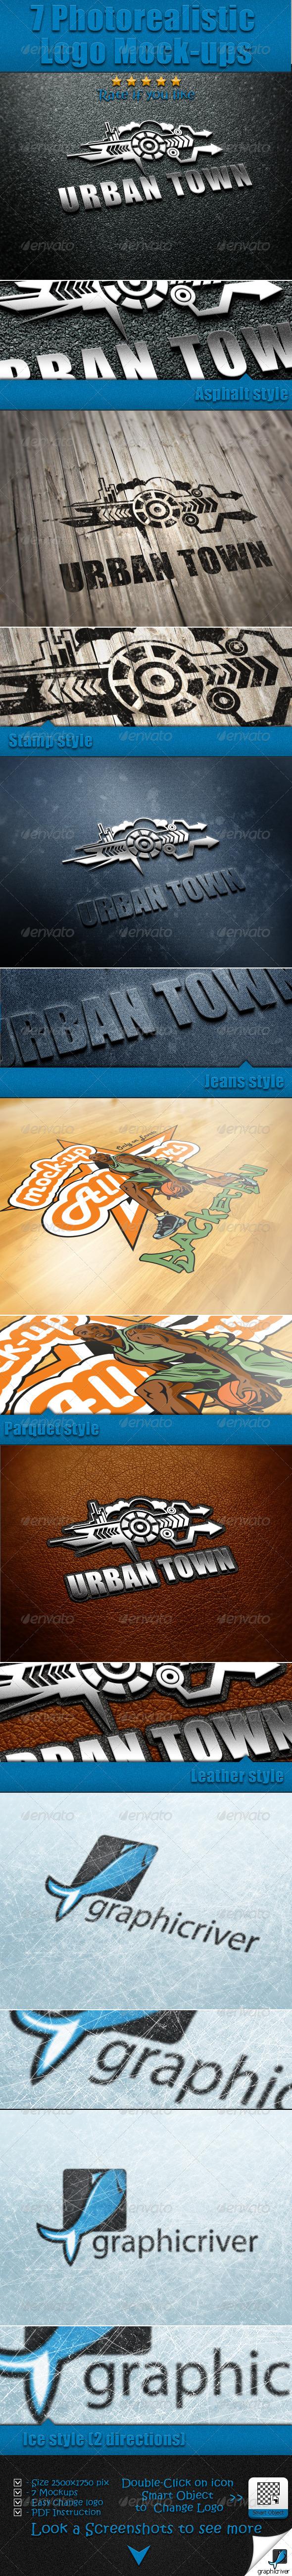 GraphicRiver 7 Photorealistic Logo Mock-Ups 6237030